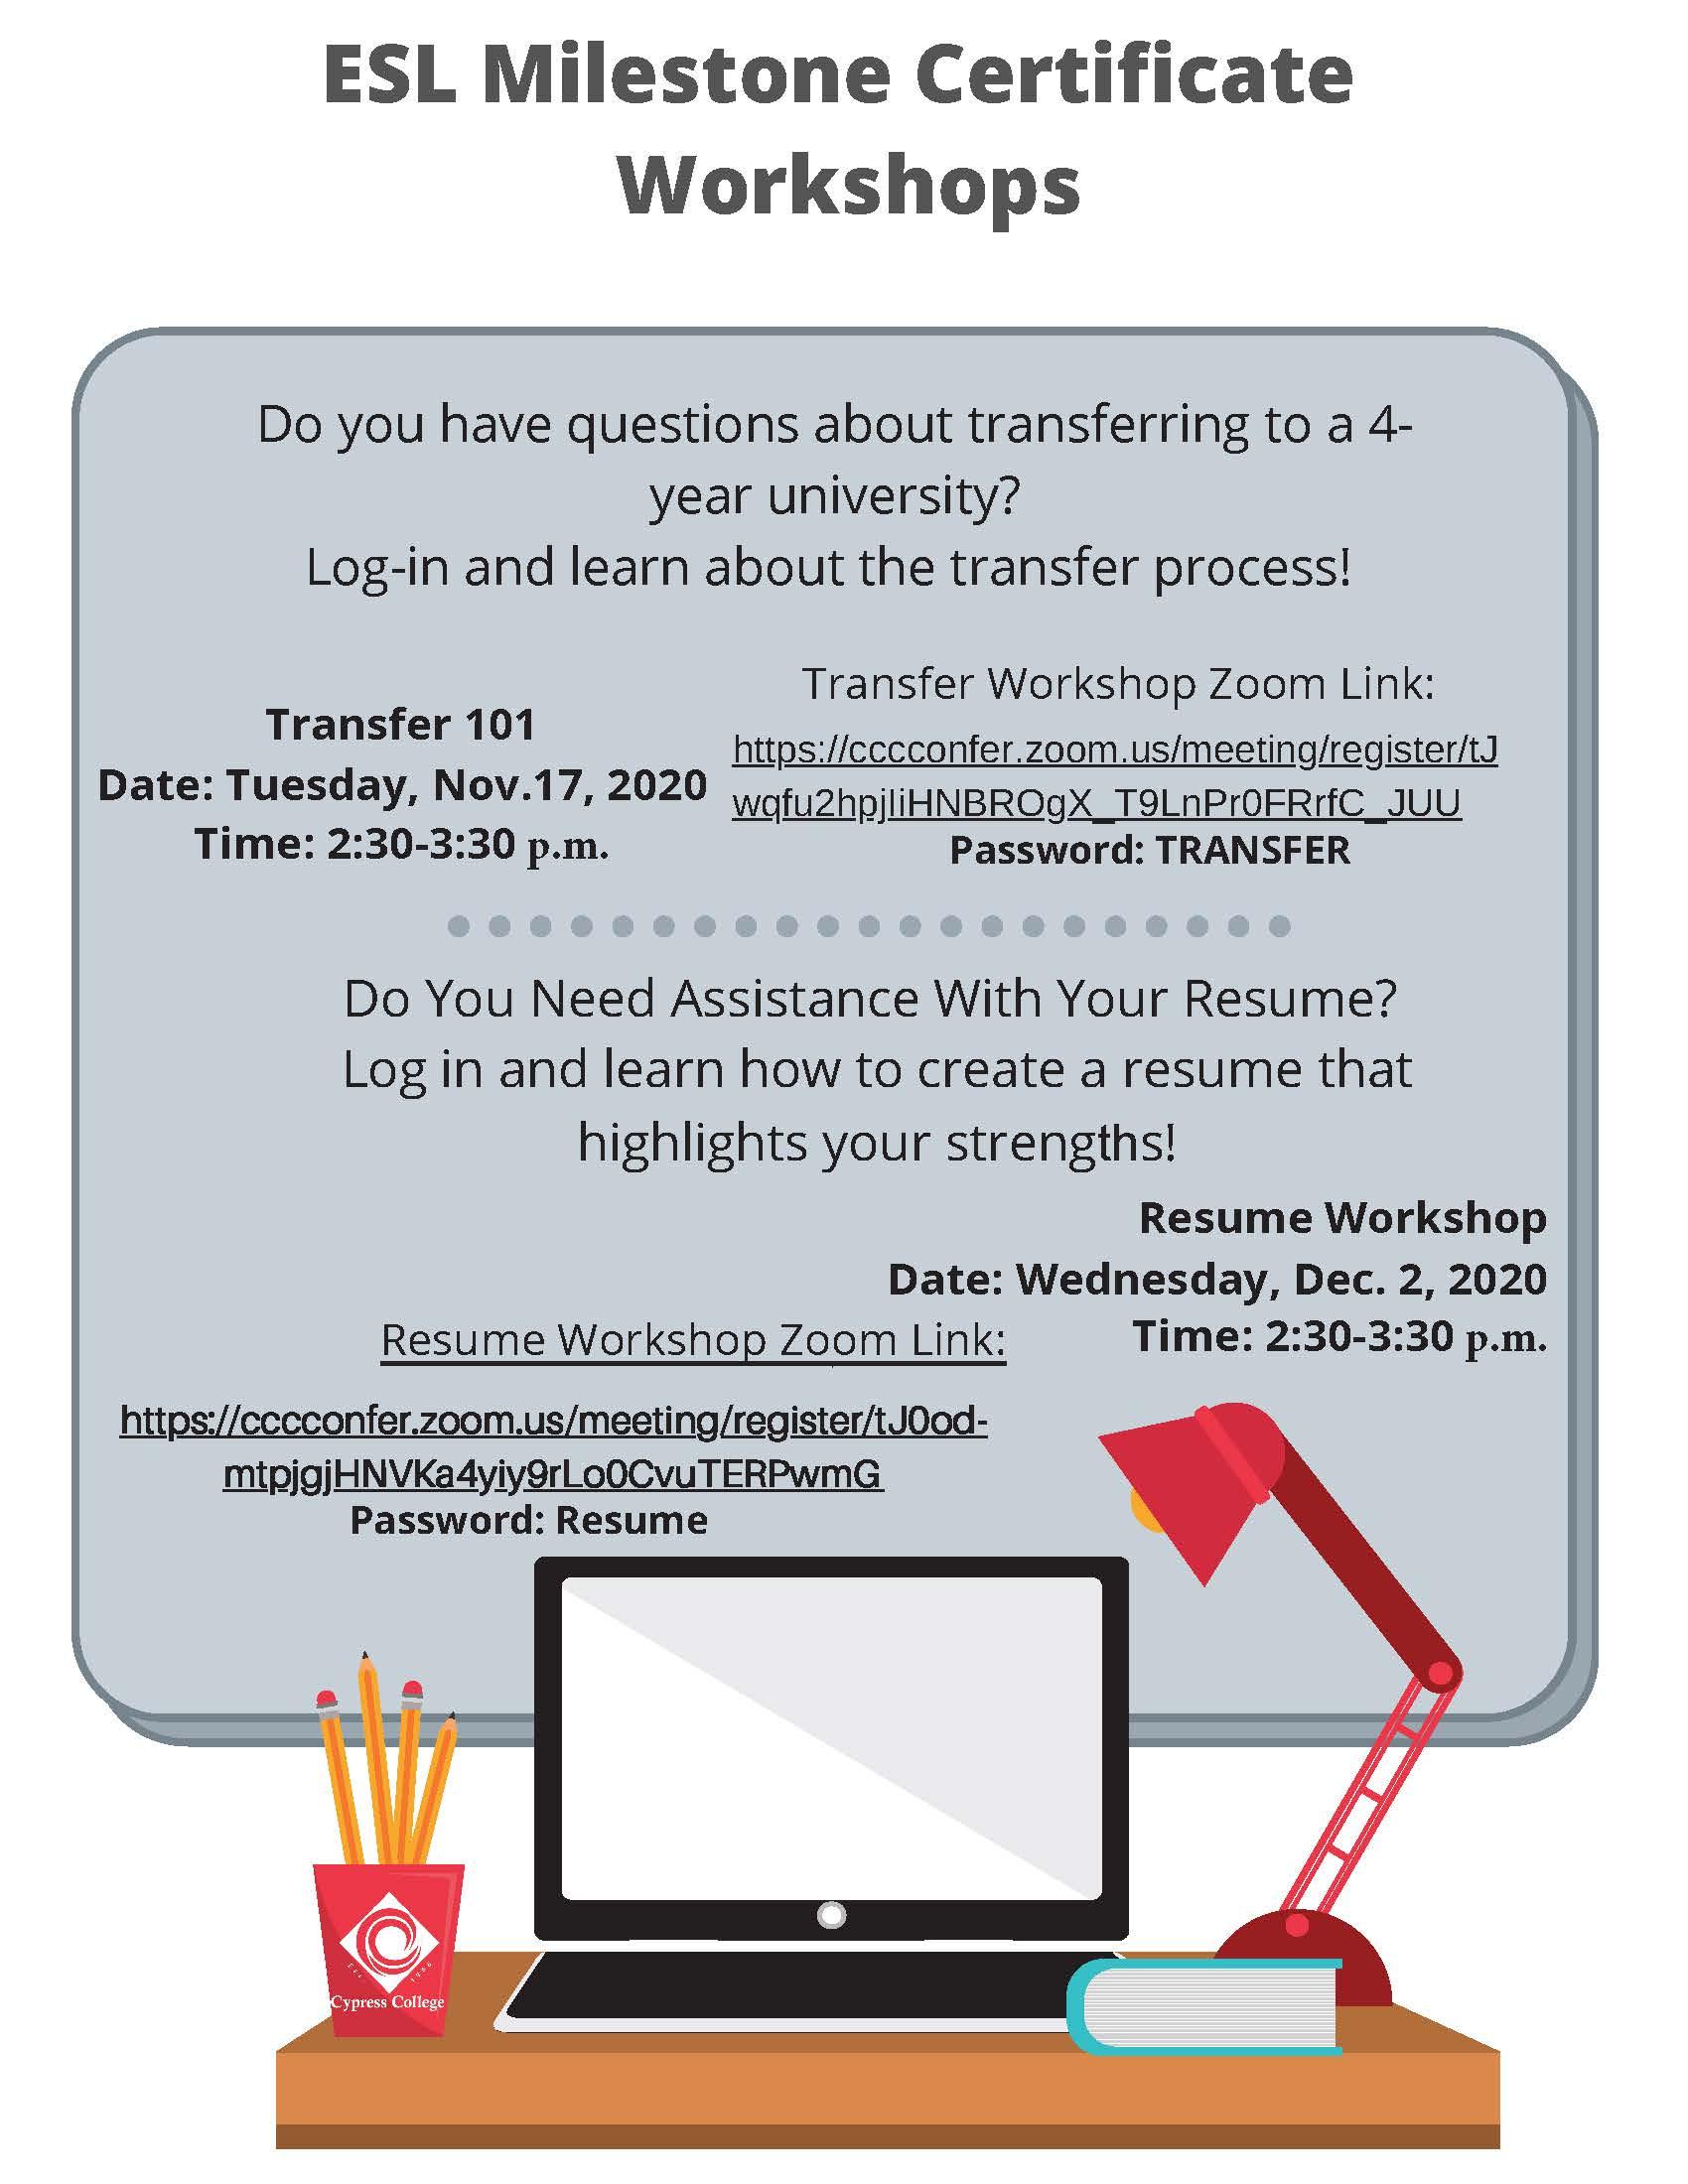 ESL Milestone Certificate Workshops flyer